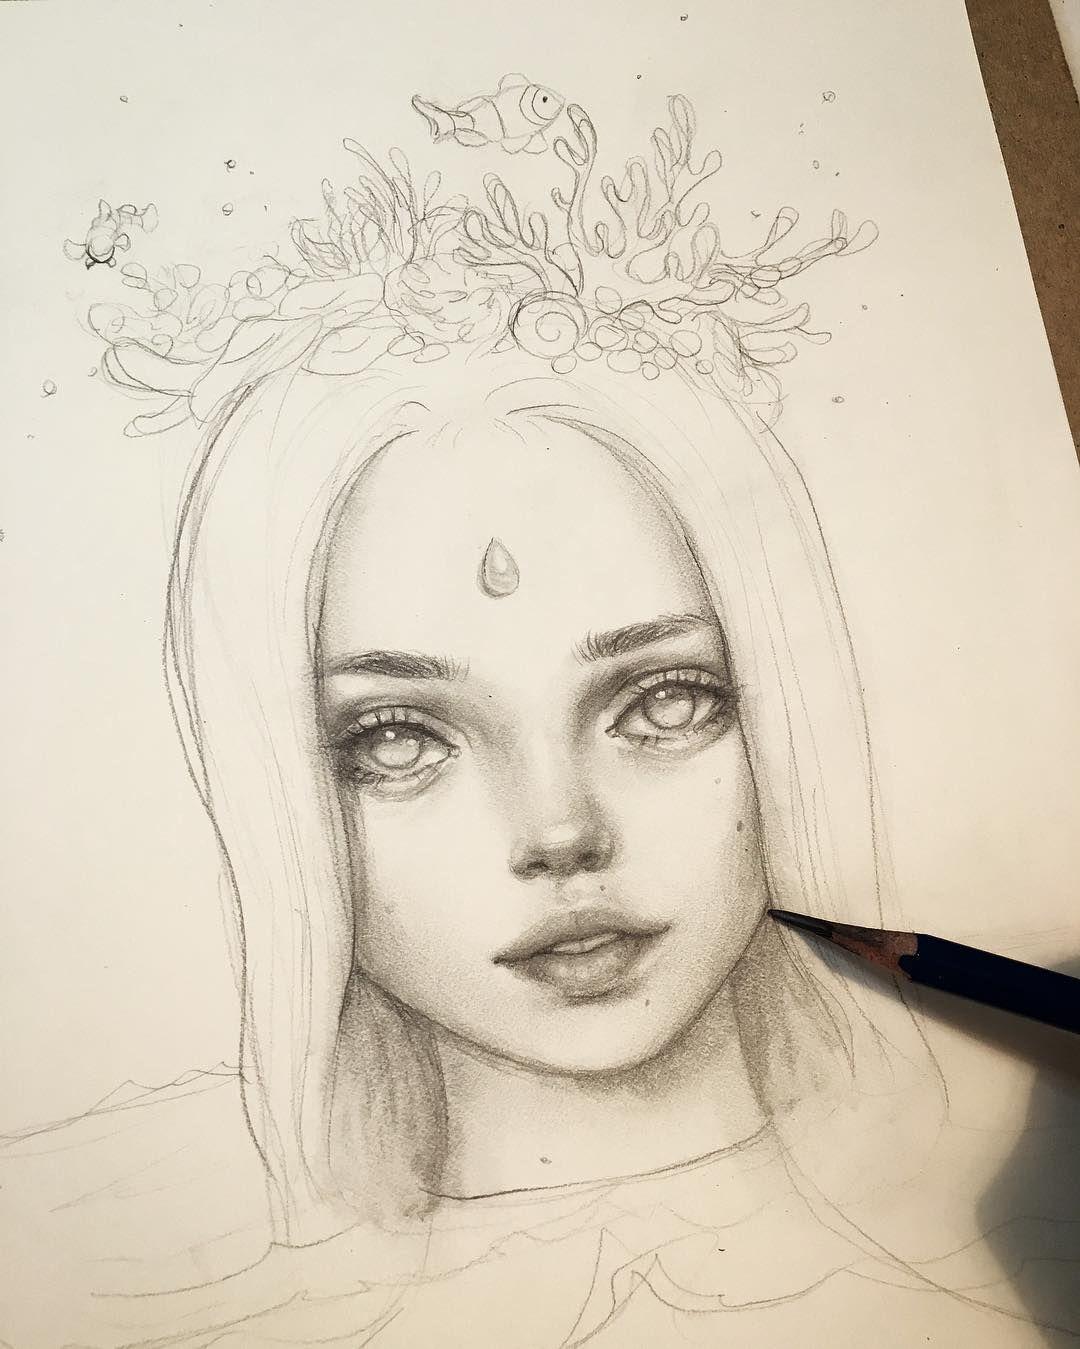 "5,811 vind-ik-leuks, 41 reacties - Happy D. (@happydartist) op Instagram: 'Working on ""Coral"" today. She will be an oil painting soon!  #illustration #wip #drawing…'"